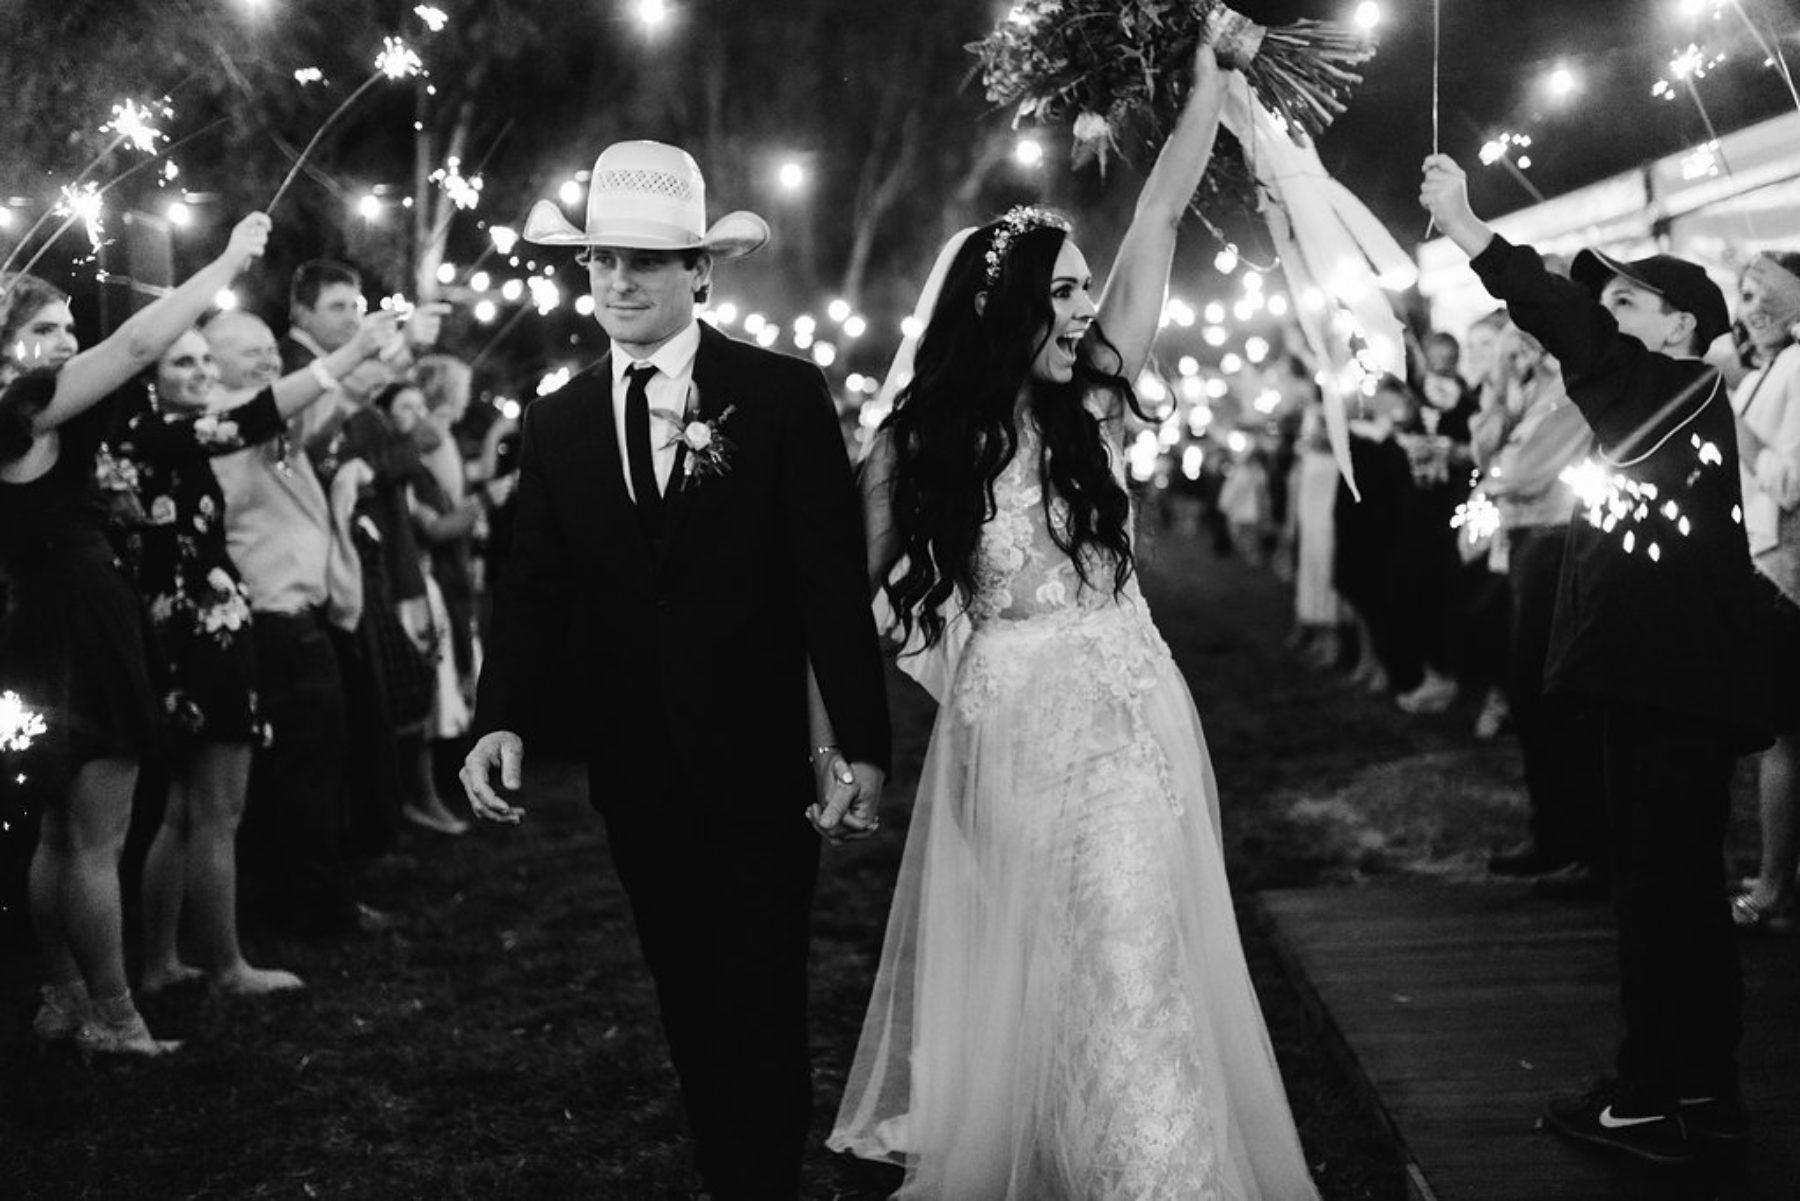 Josh Vicki S Glam Cattle Station Wedding Nouba Com Au Bush Wedding Country Wedding Wedding